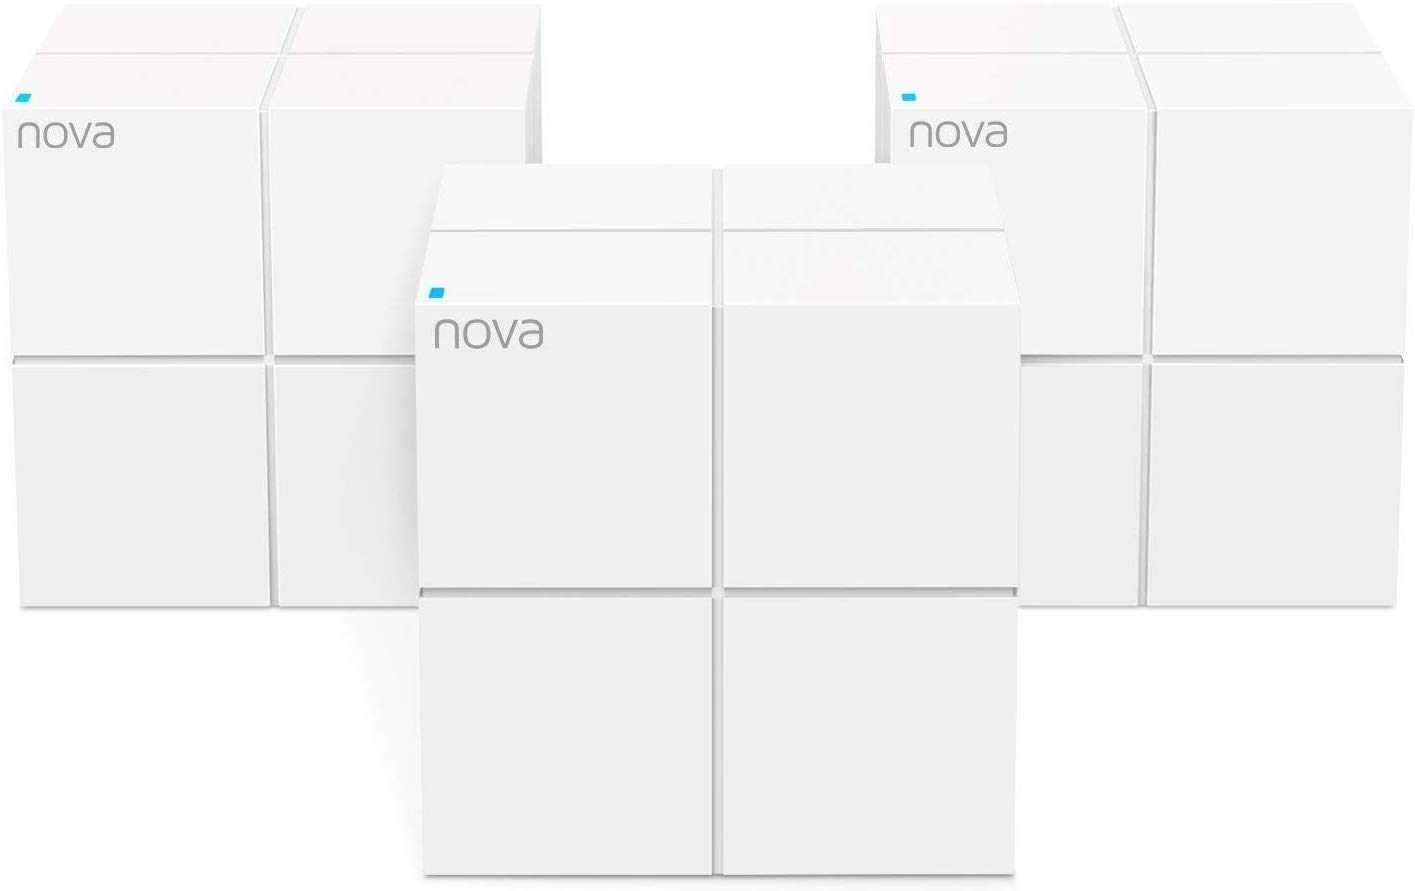 Tenda Nova MW6 [Pack-3] / Mesh / AC1200 Whole Home Mesh WiFi System ของแท้ ประกันศูนย์ 5ปี